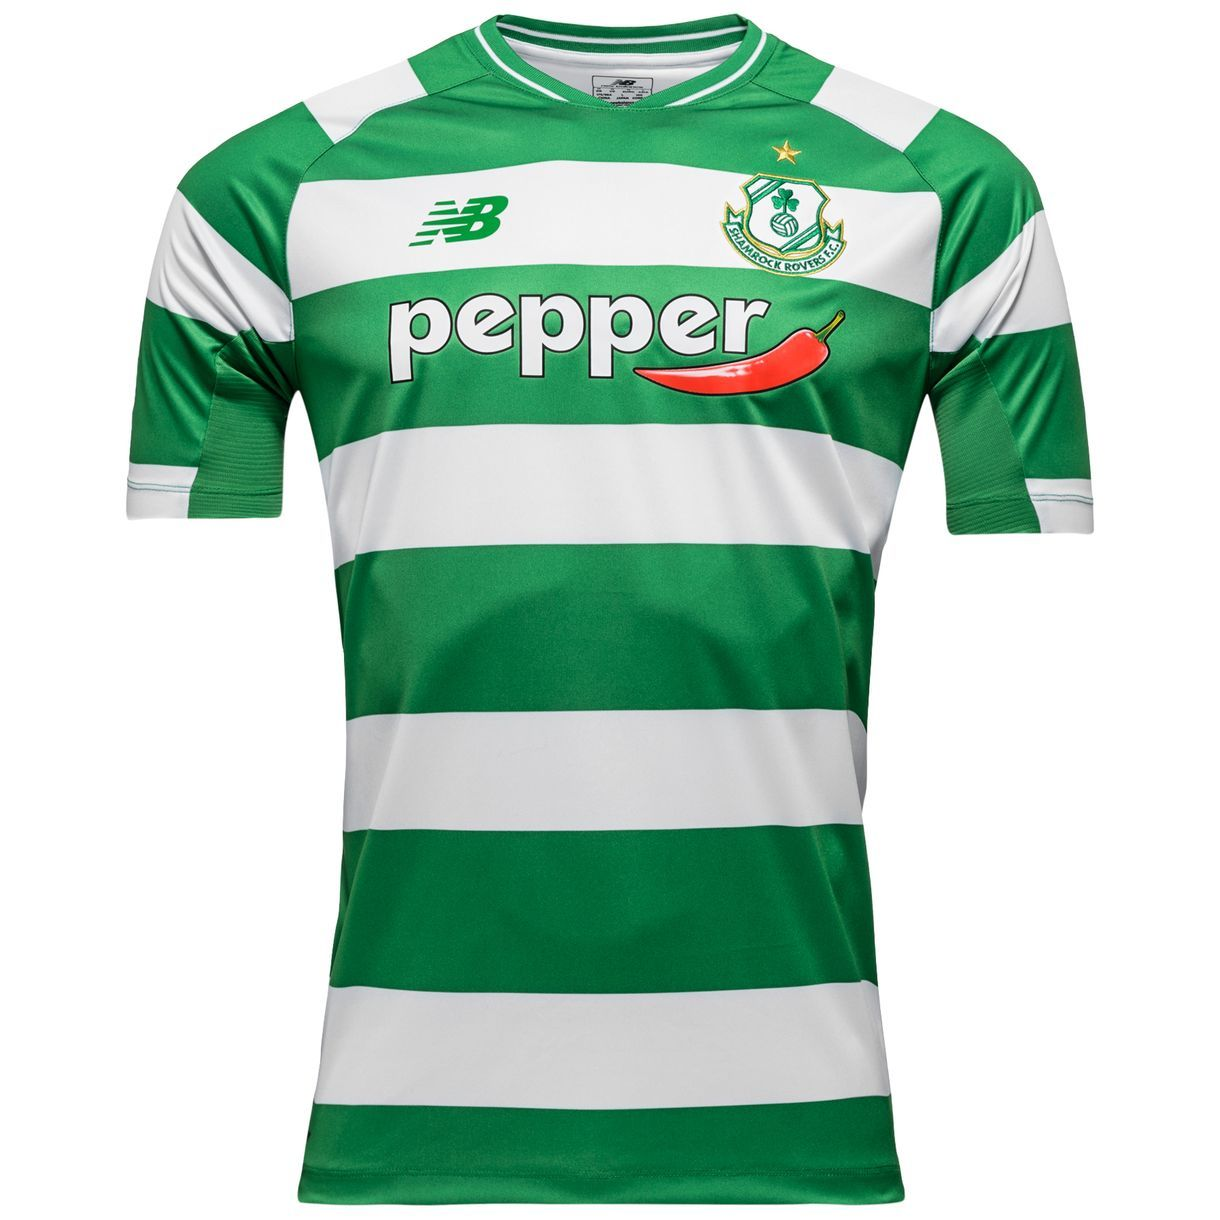 Shamrock Rovers FC (Ireland) - 2016 New Balance Home Shirt ... 9ce3c34bdf5cc